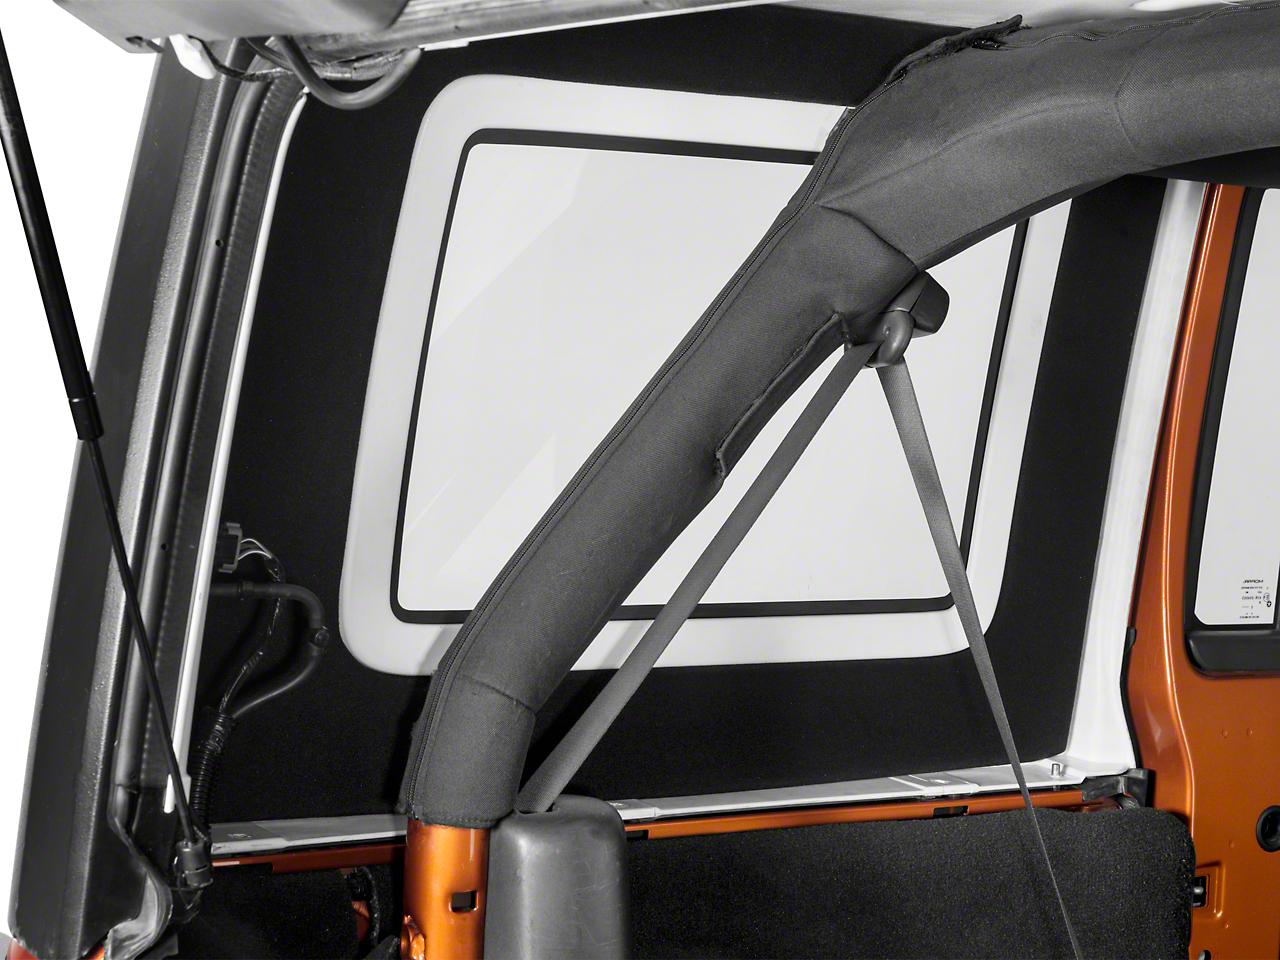 Hothead Hard Top Rear Side Window Kit - Black (07-18 Wrangler JK 4 Door)